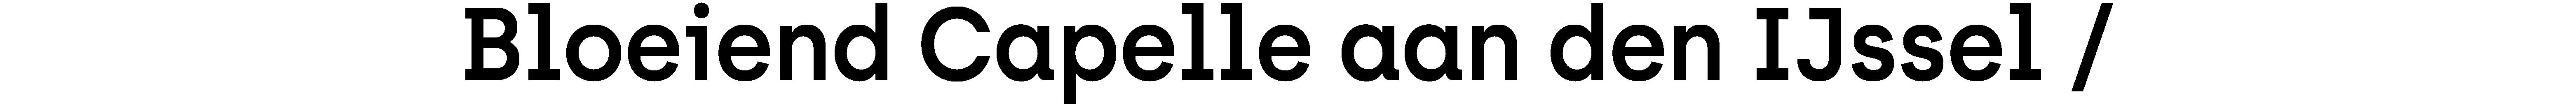 a8eb4310-1cf3-11eb-bcce-b7840fee3047.png